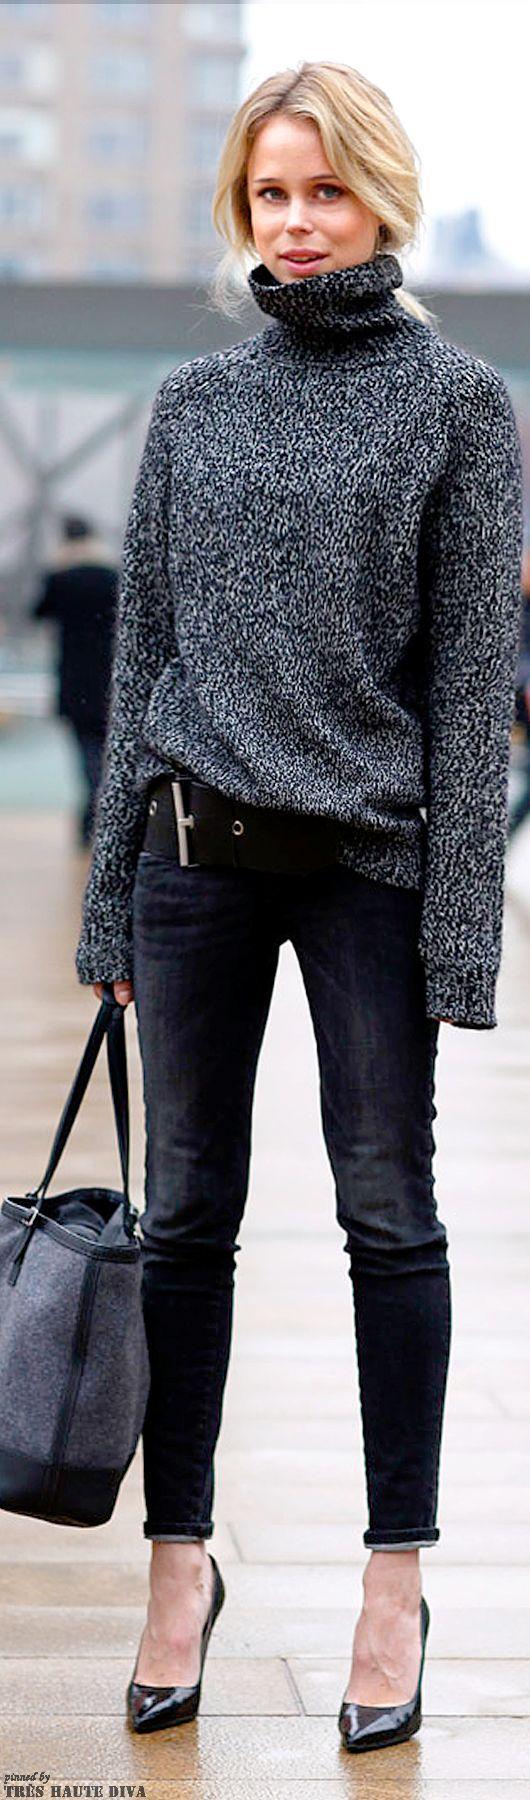 Elin King - Turtleneck Sweater, Black Jeans, Grey Celine Tote ...